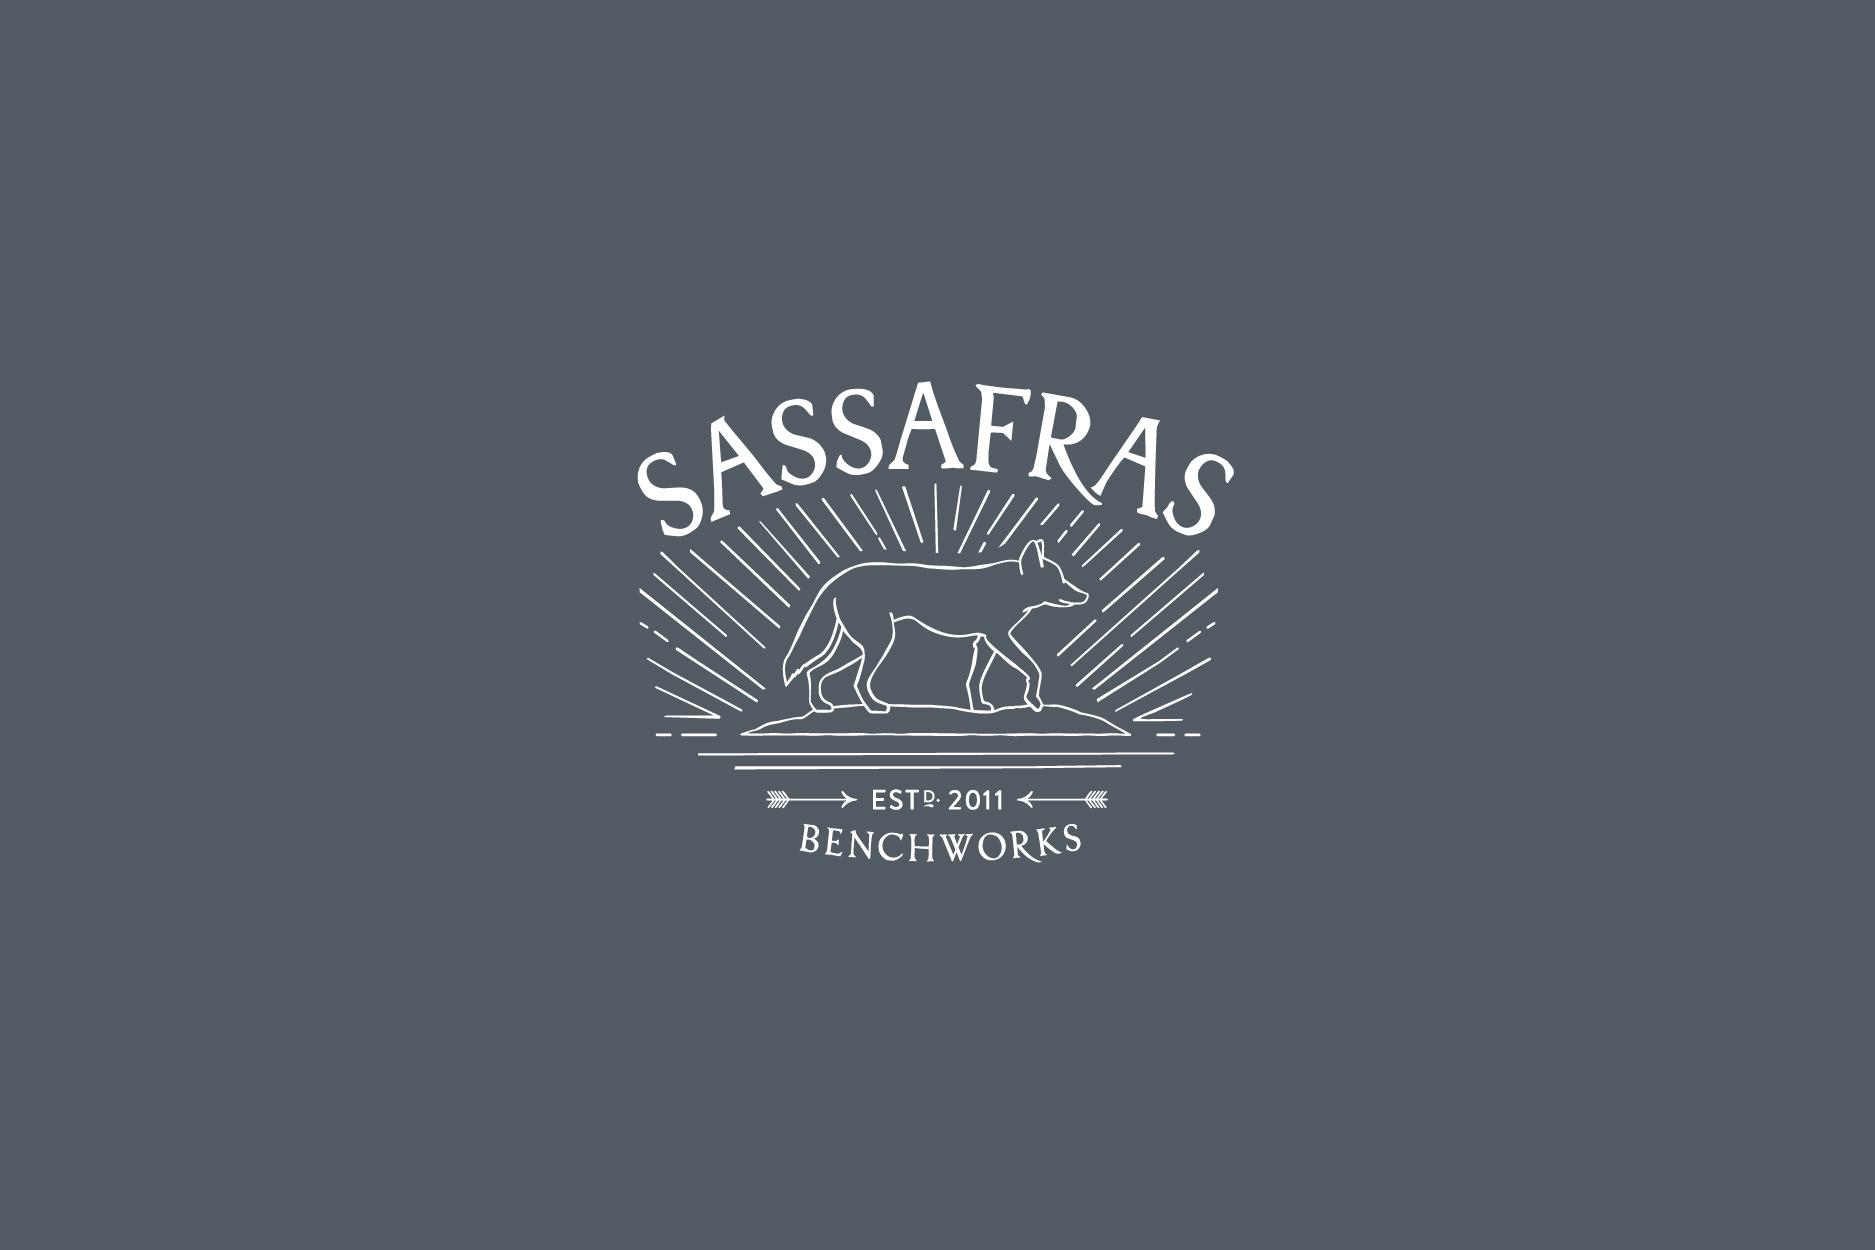 FGD_01_Sassafras.jpg